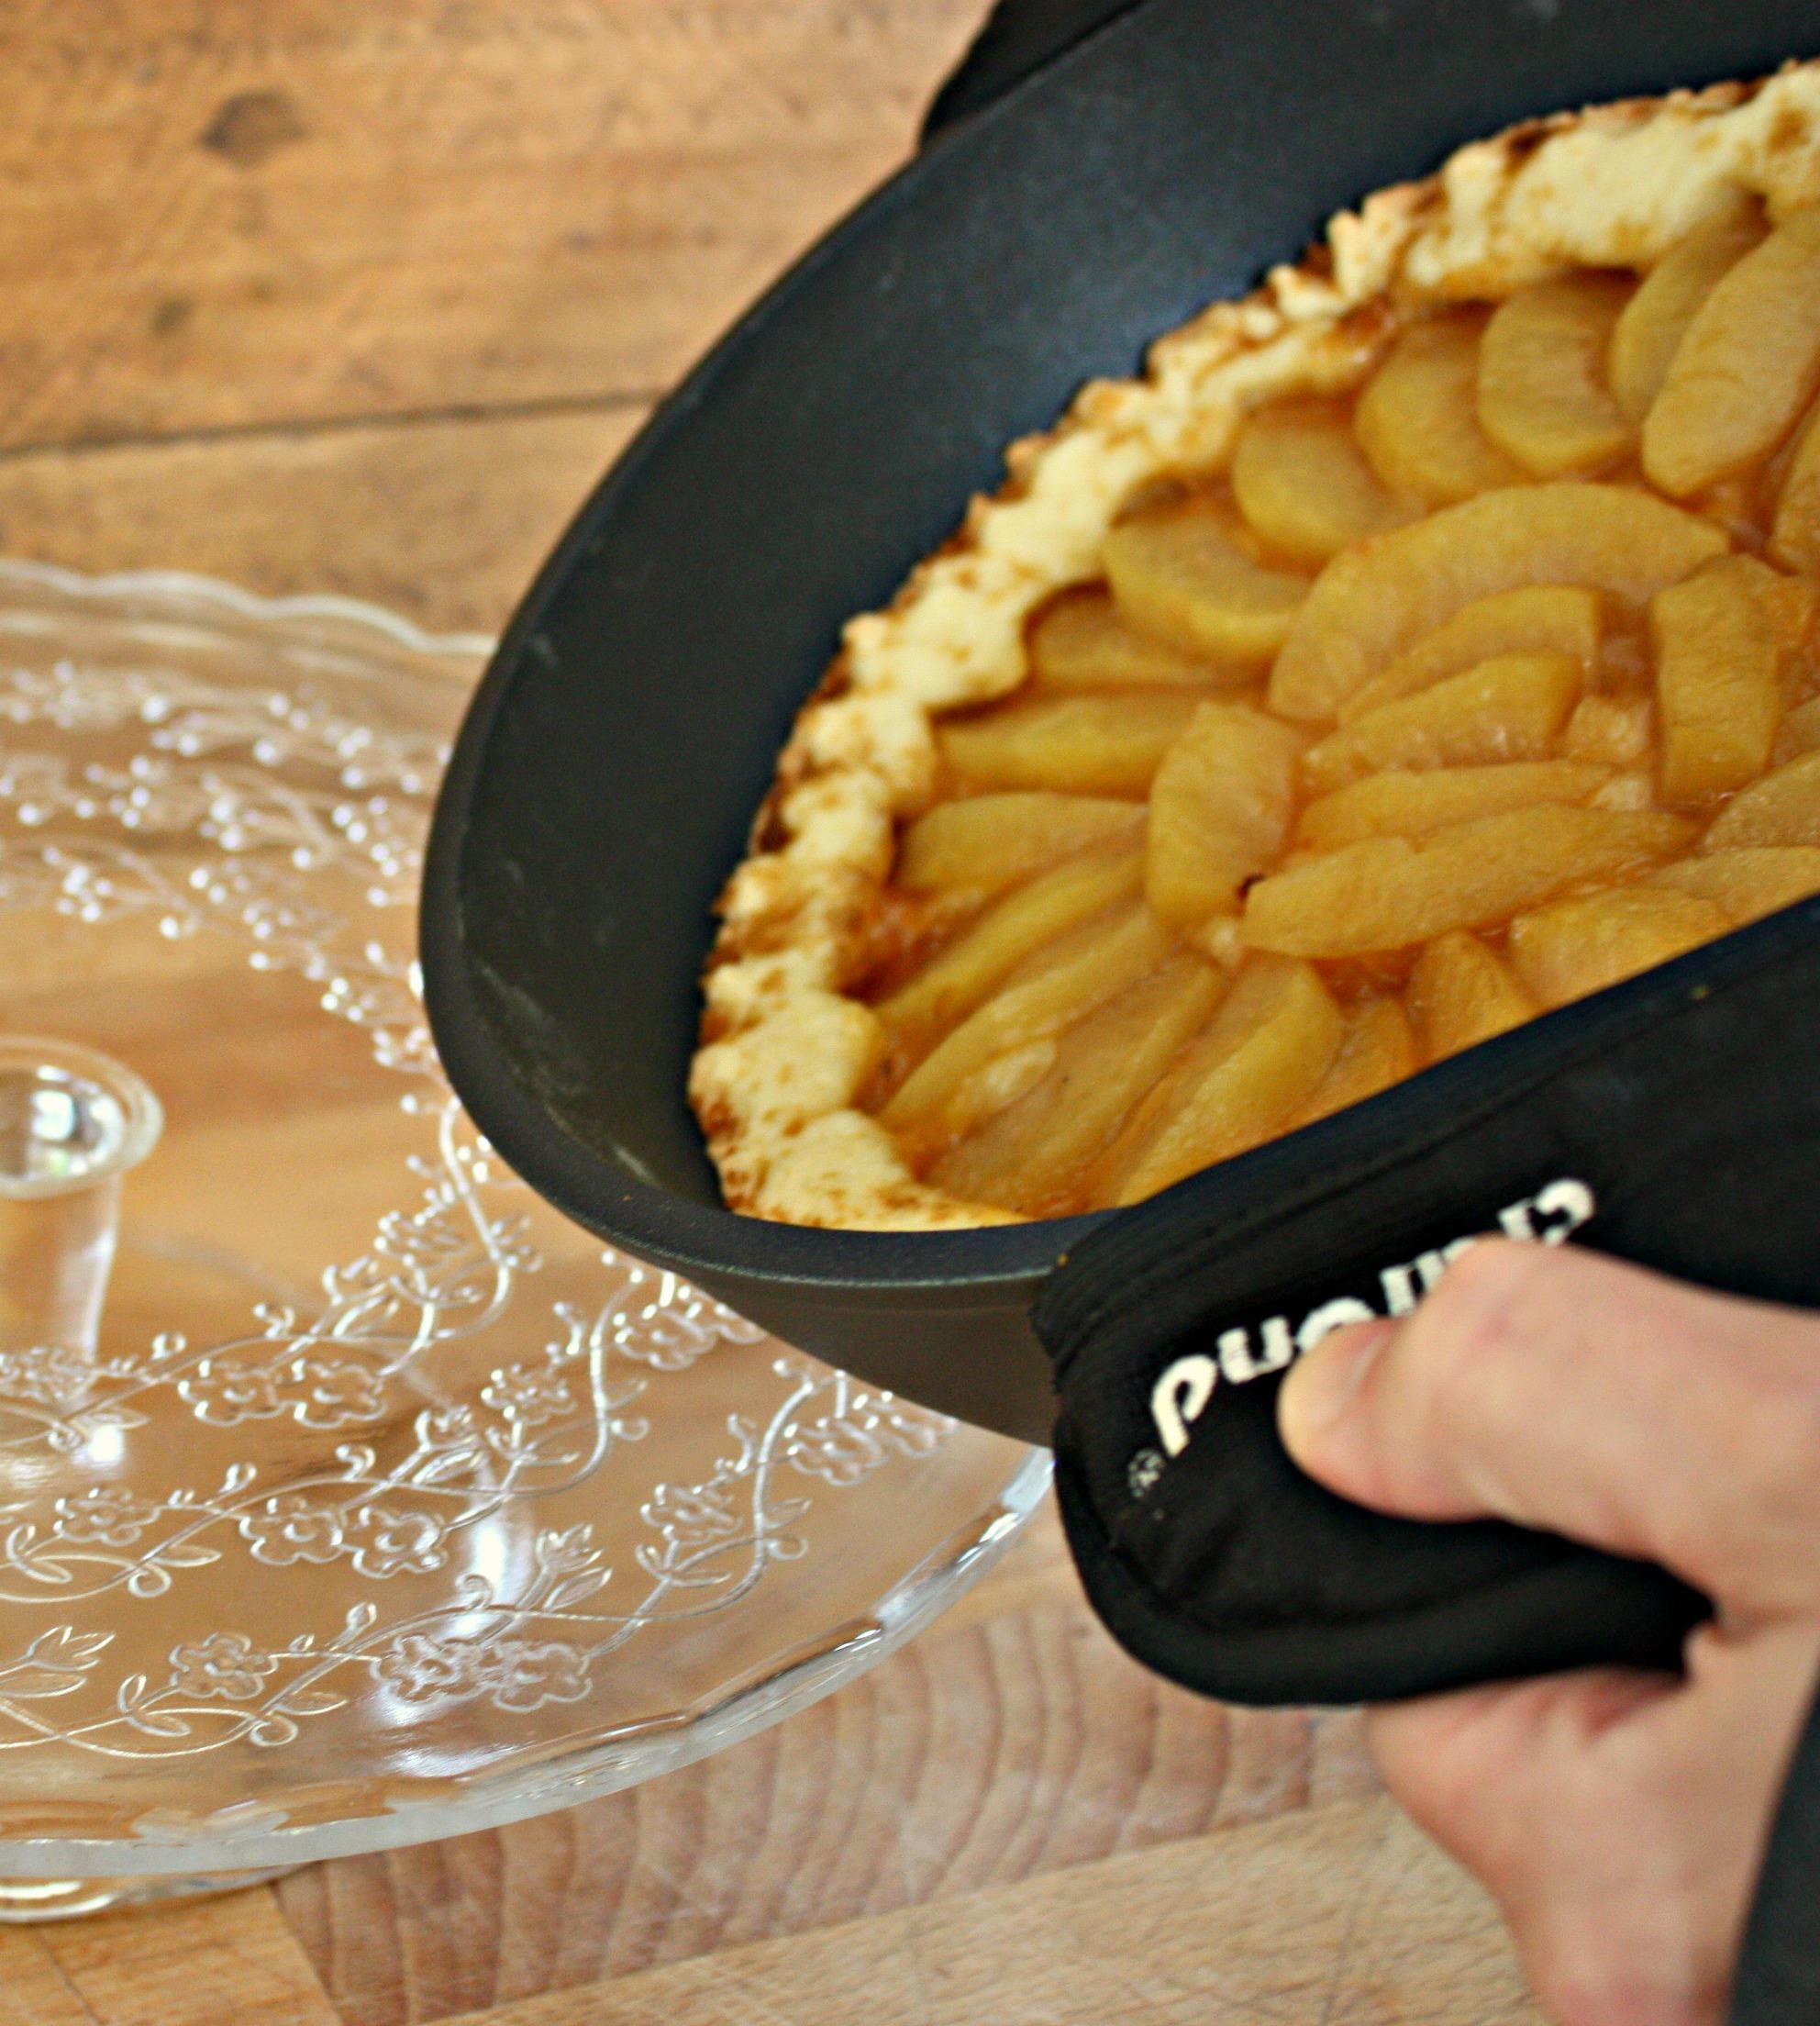 Crostata di mele cotta in padella for Crostata di mele